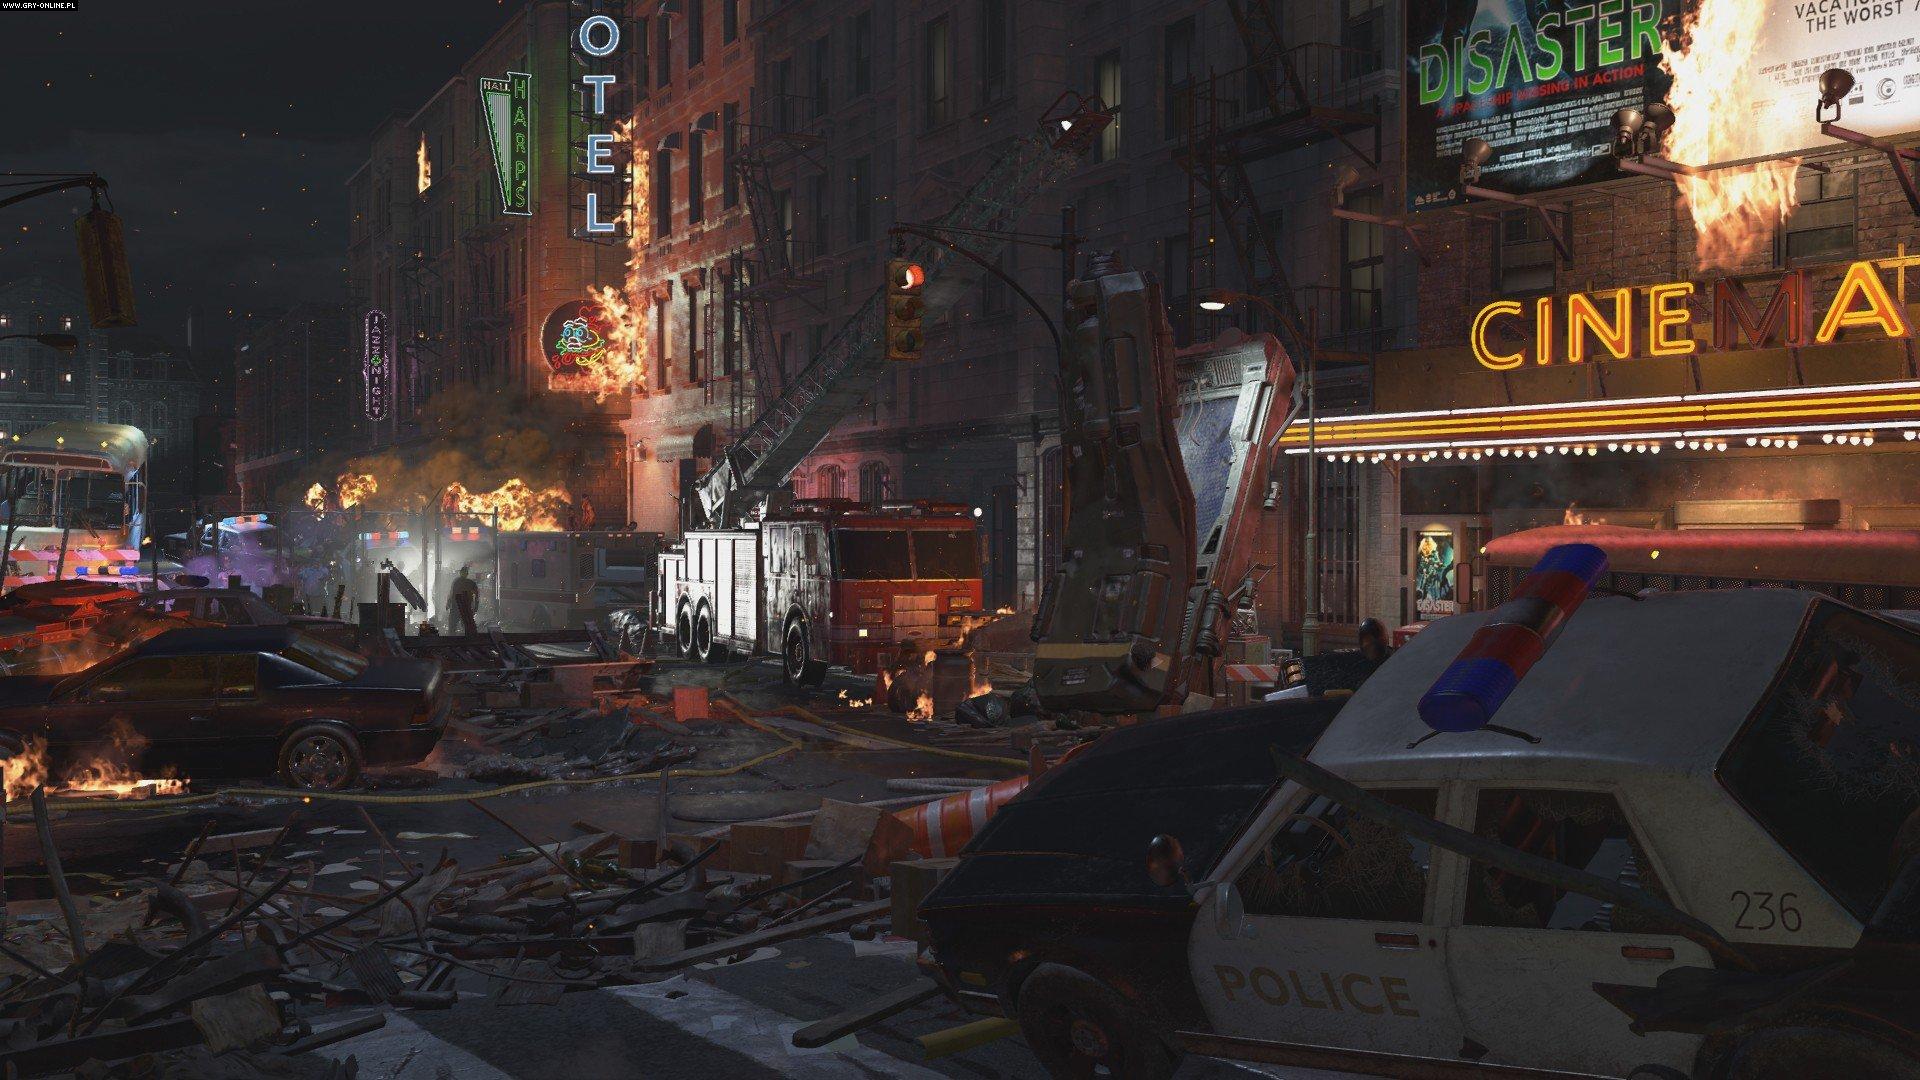 Resident Evil 3 PC, PS4, XONE Games Image 34/38, Capcom